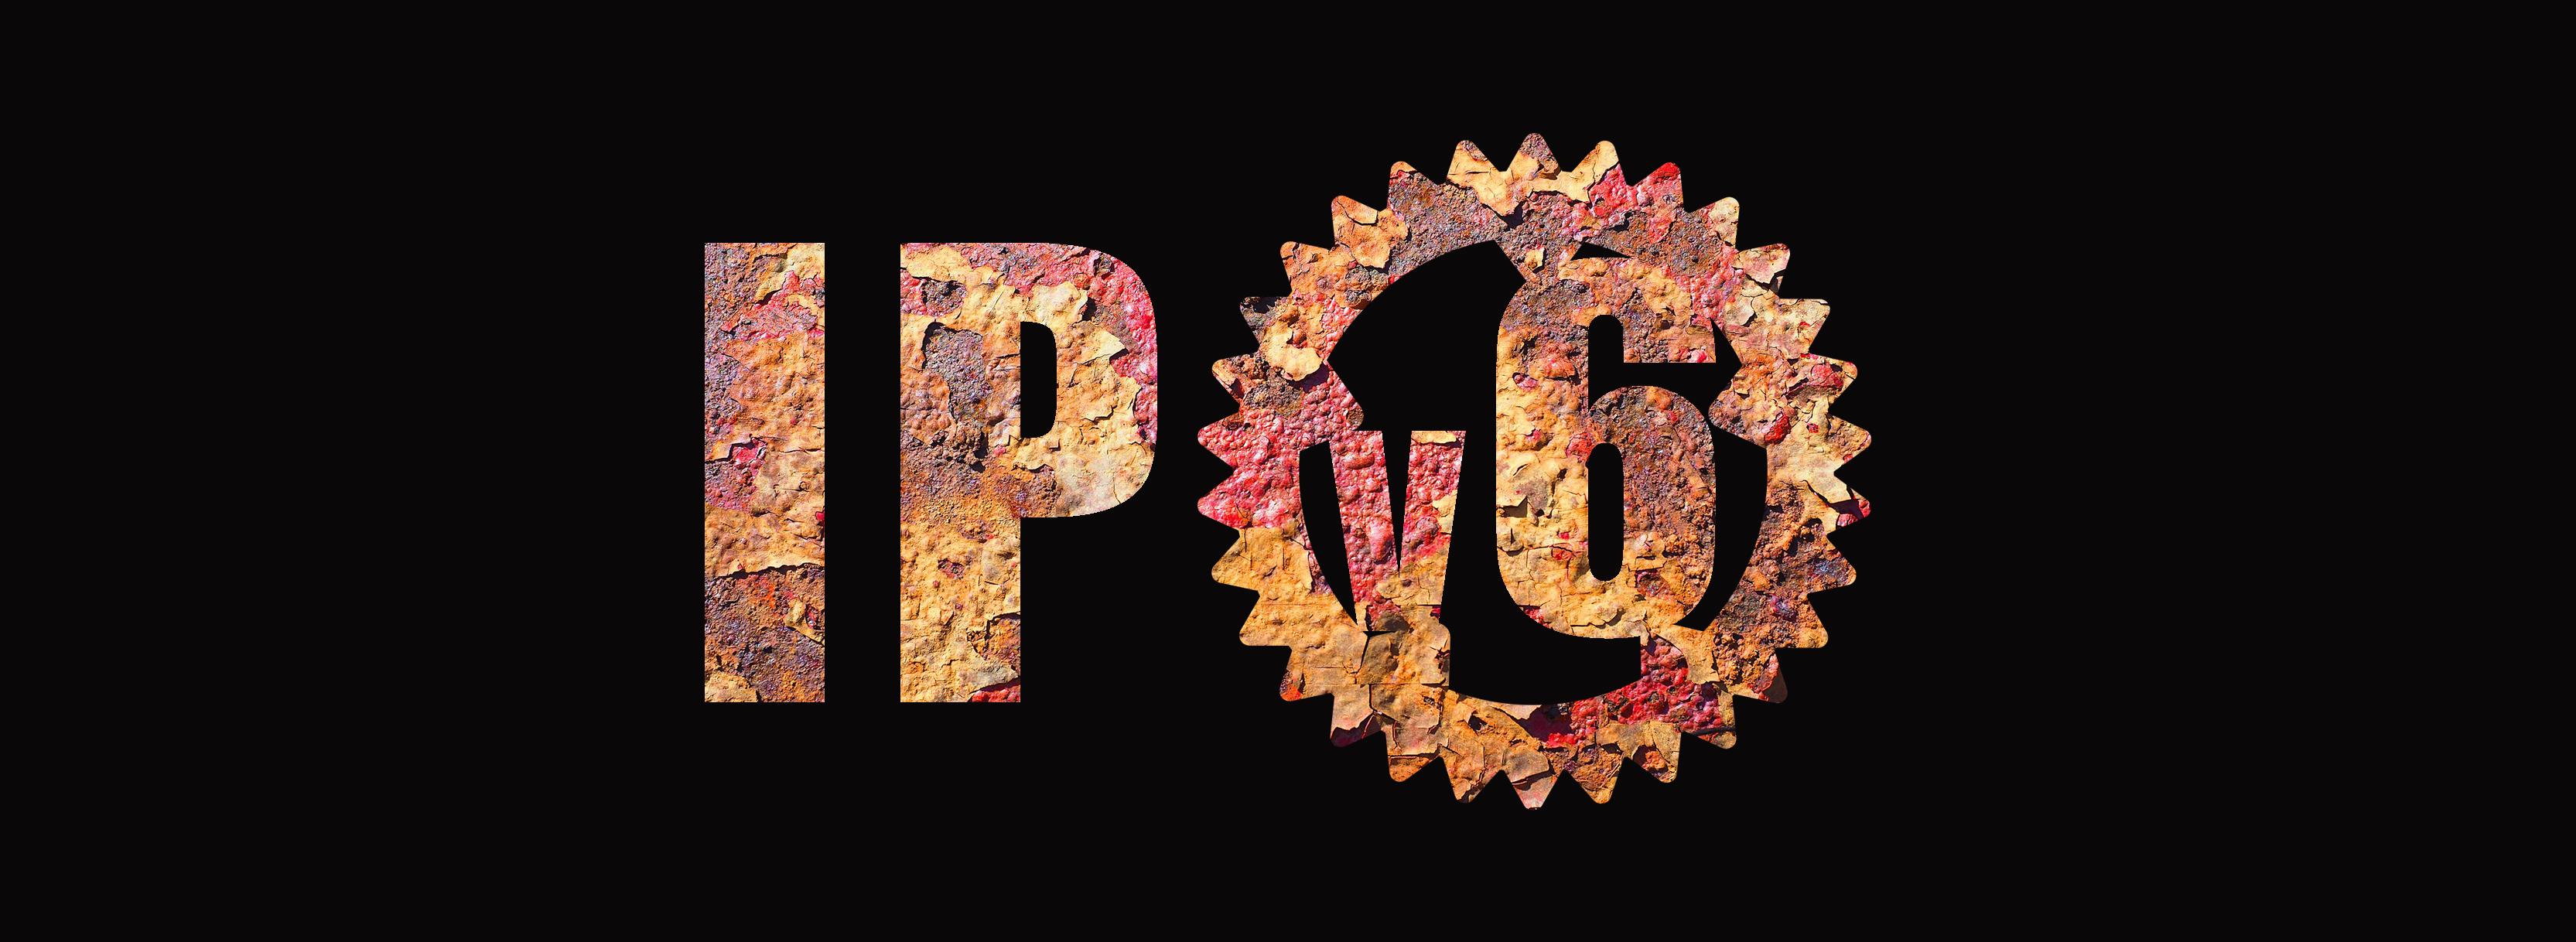 IPv6 and Rust